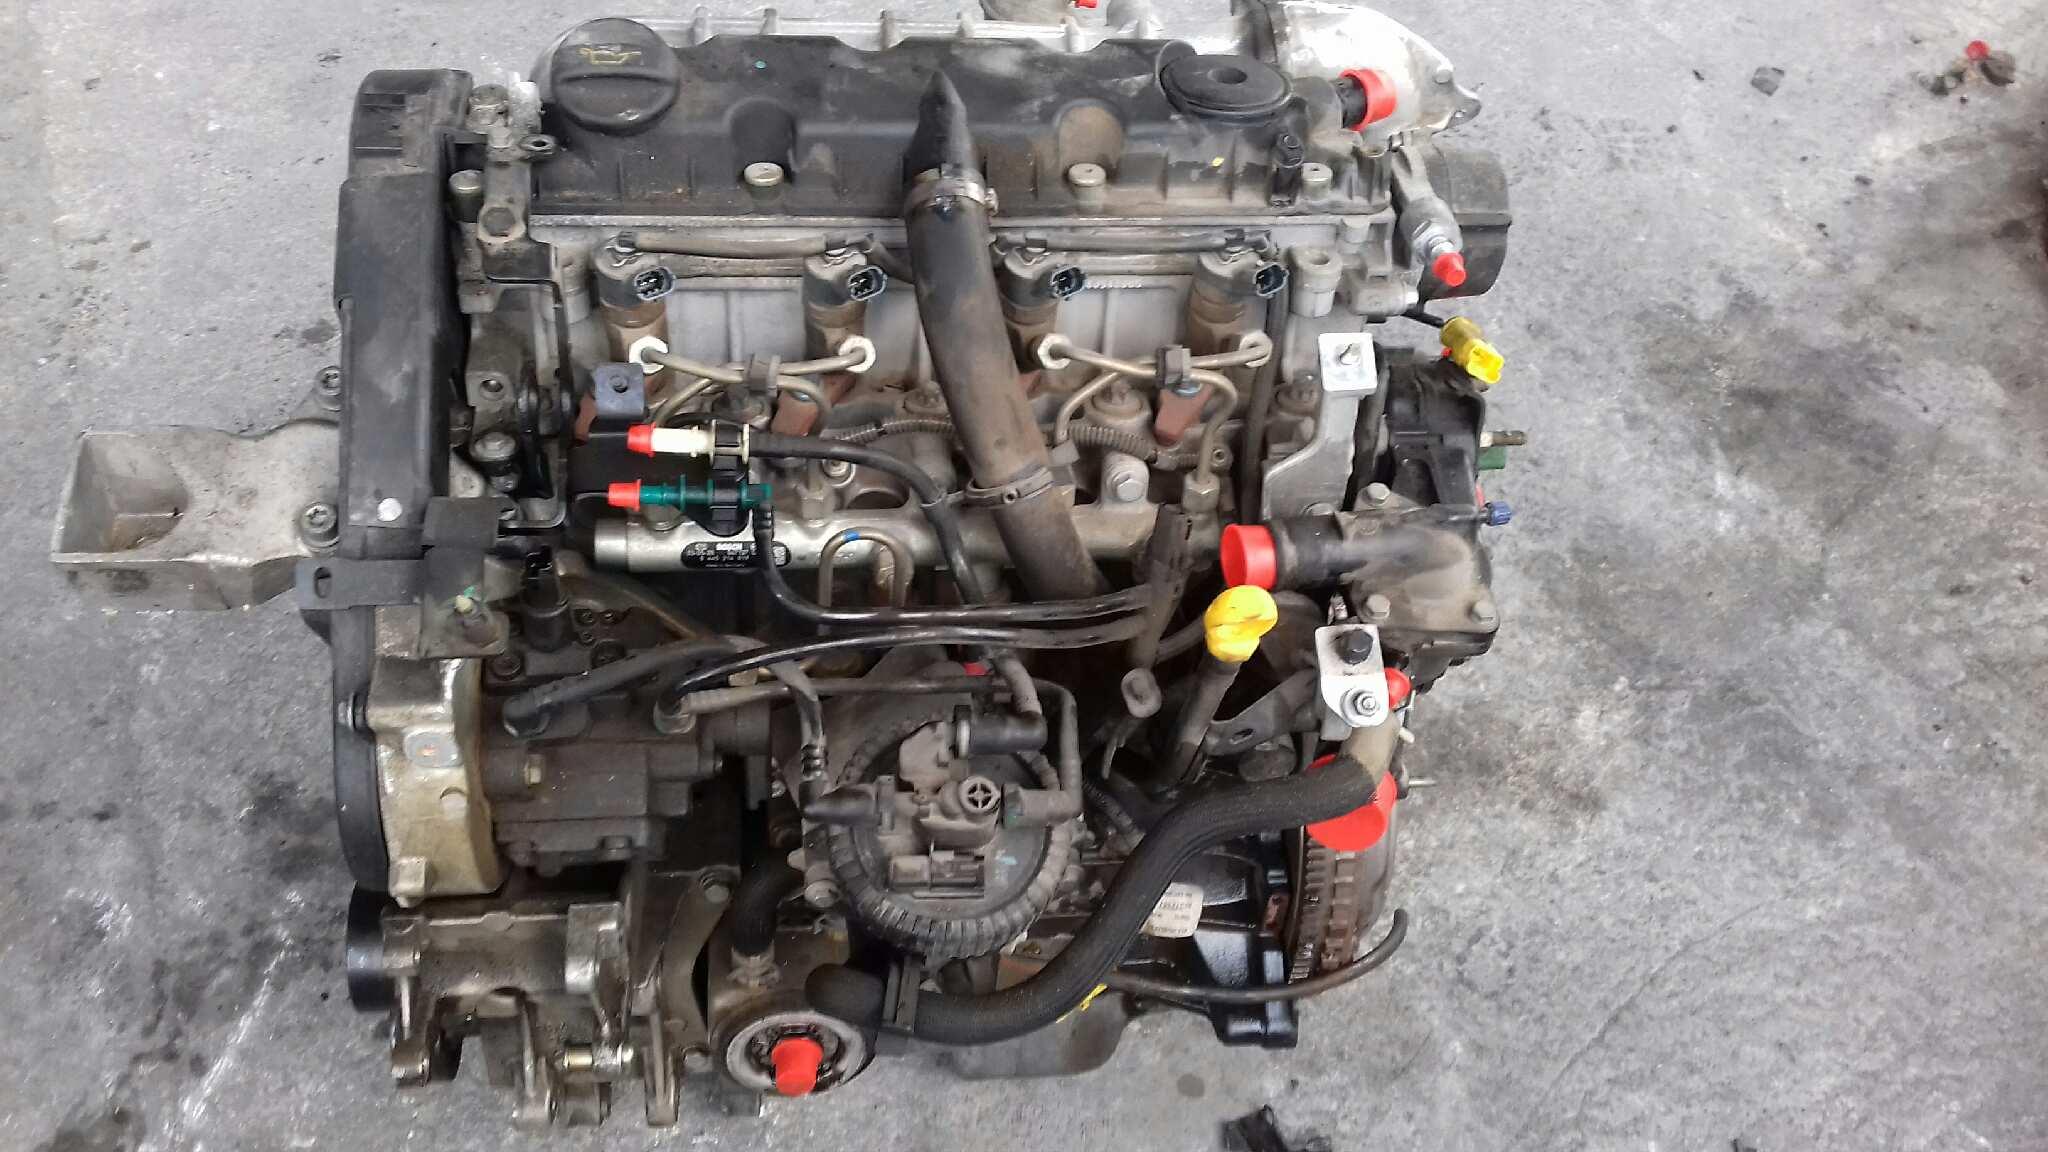 Motor completo de Peugeot 206 sw (2002 - 2007) RHY